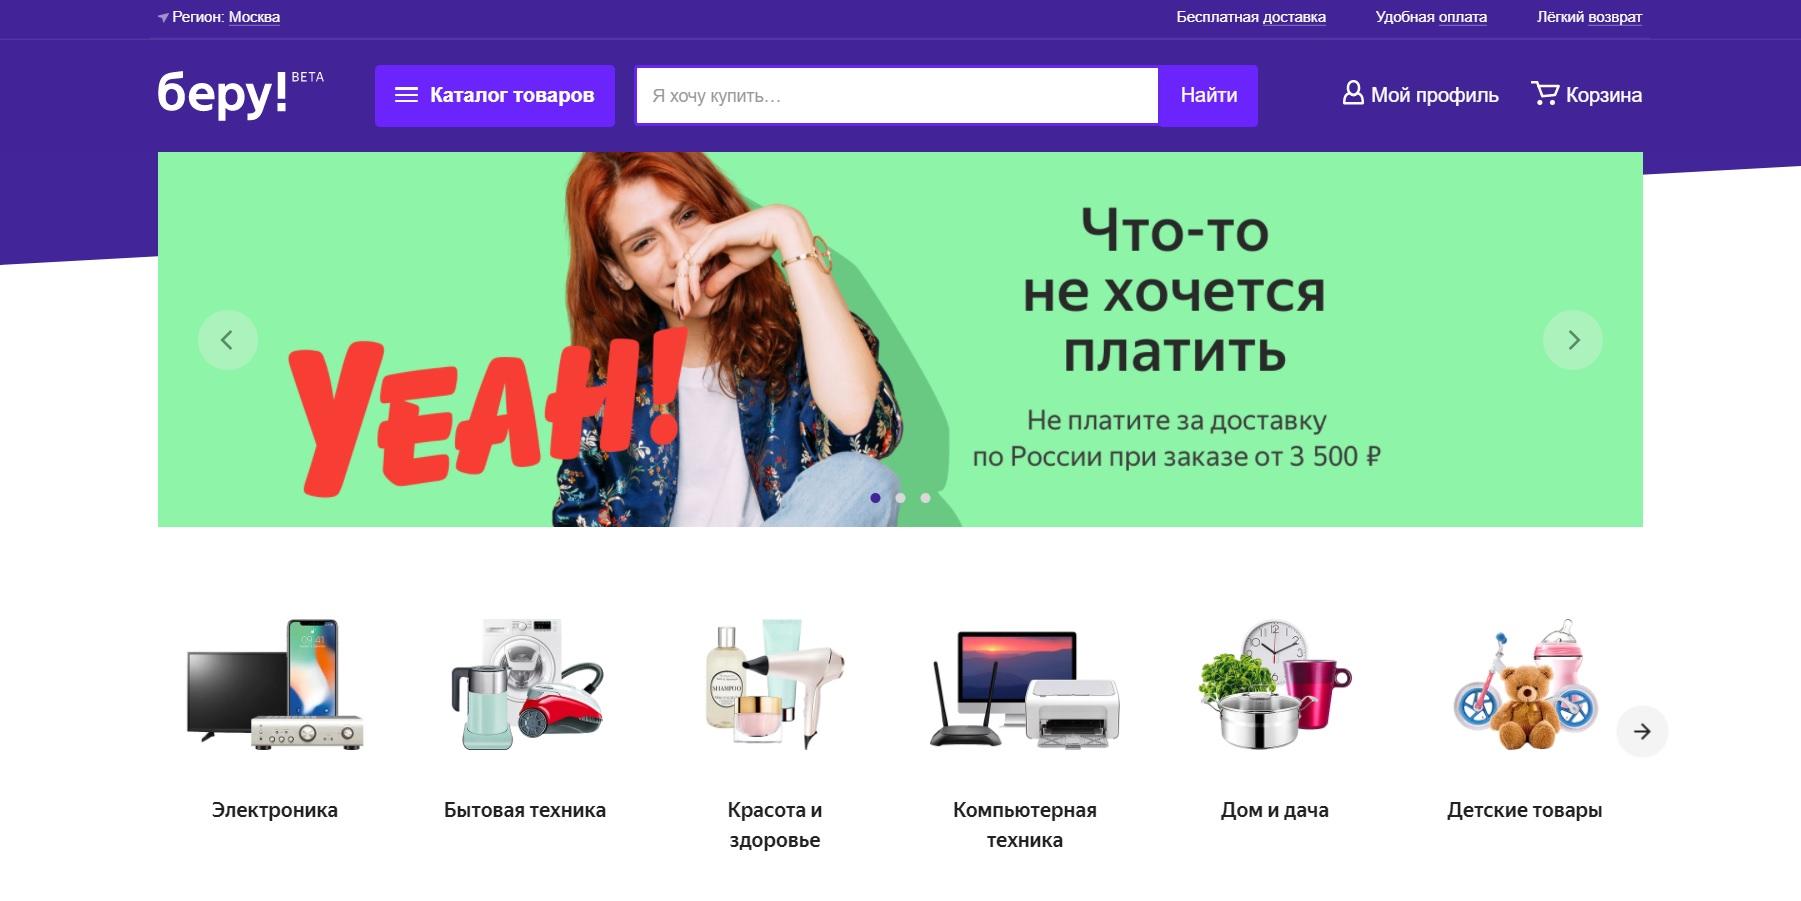 «Сбербанк» и«Яндекс» объявили озапуске бета-версии маркетплейса «Беру»